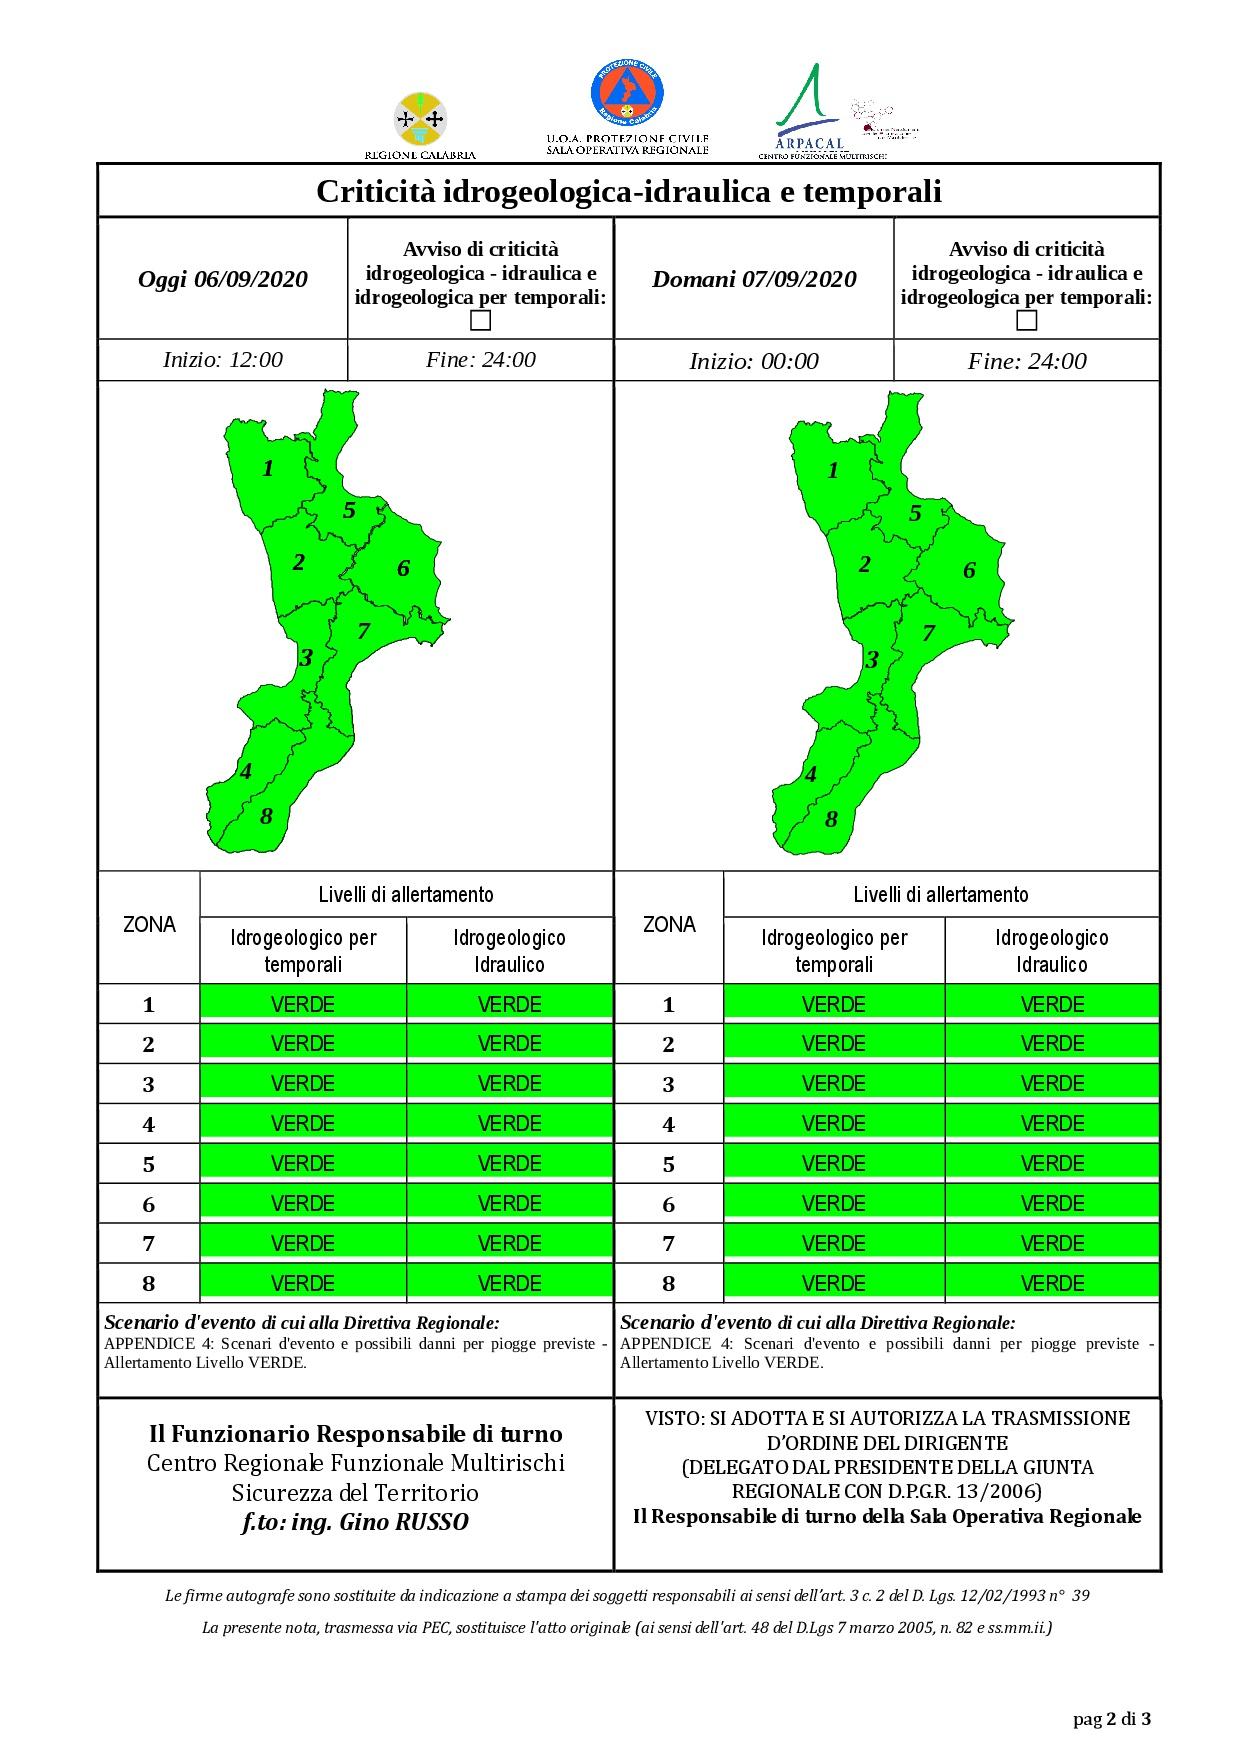 Criticità idrogeologica-idraulica e temporali in Calabria 06-09-2020